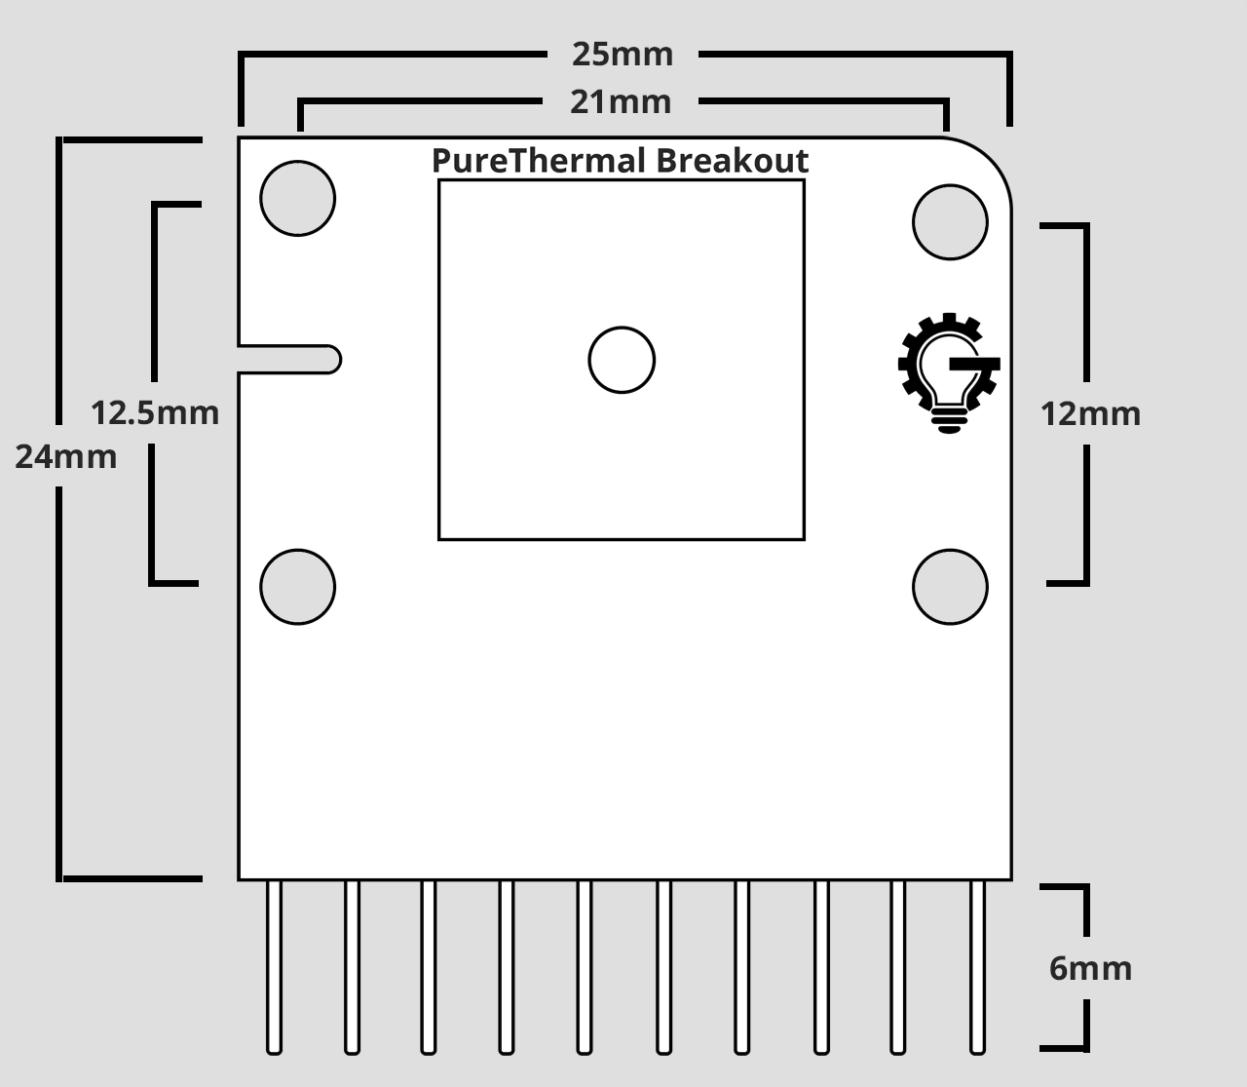 PureThermal Breakout Board Dimensions